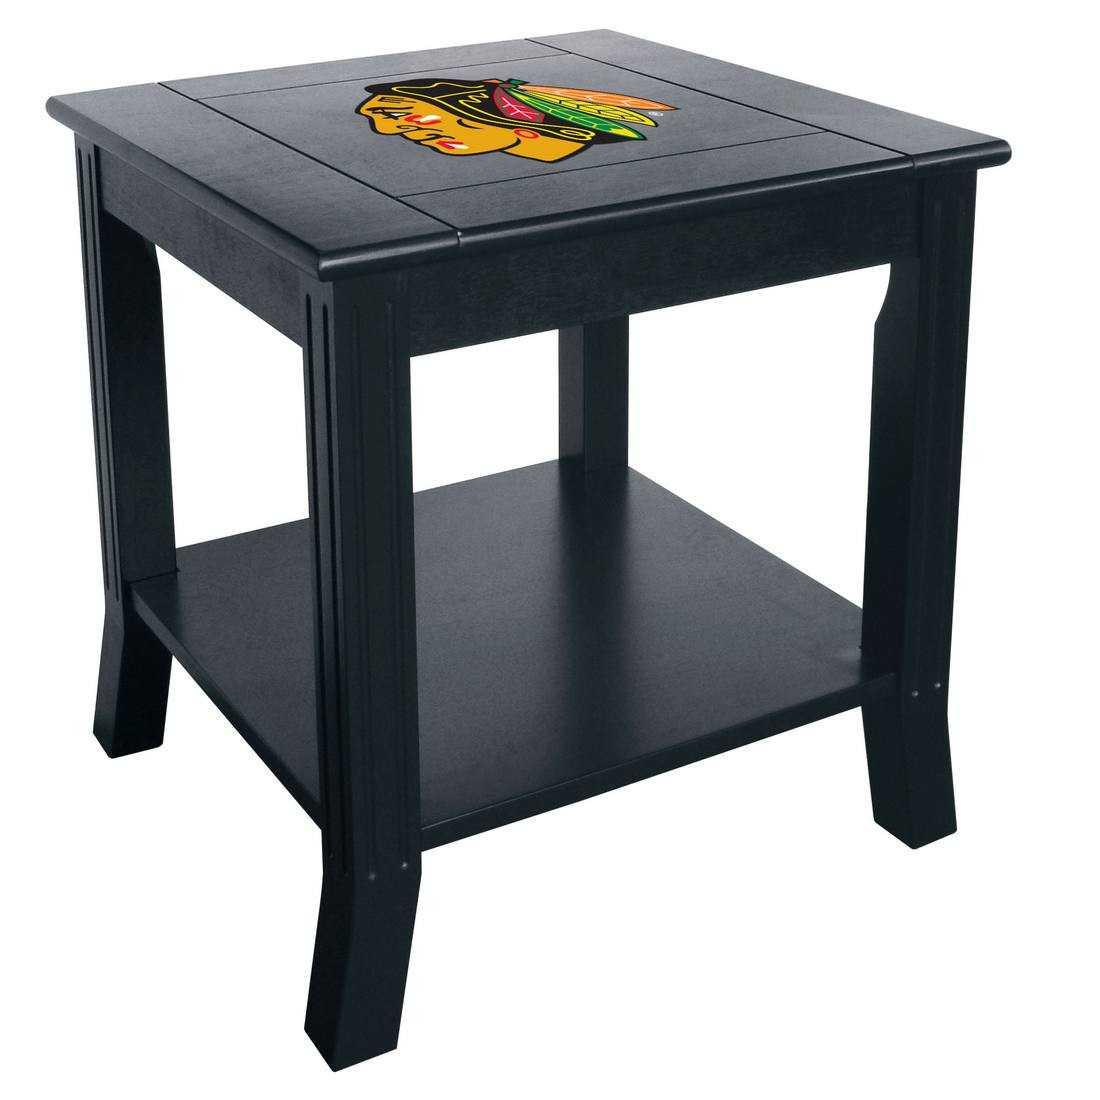 CHICAGO BLACKHAWKS SIDE TABLE